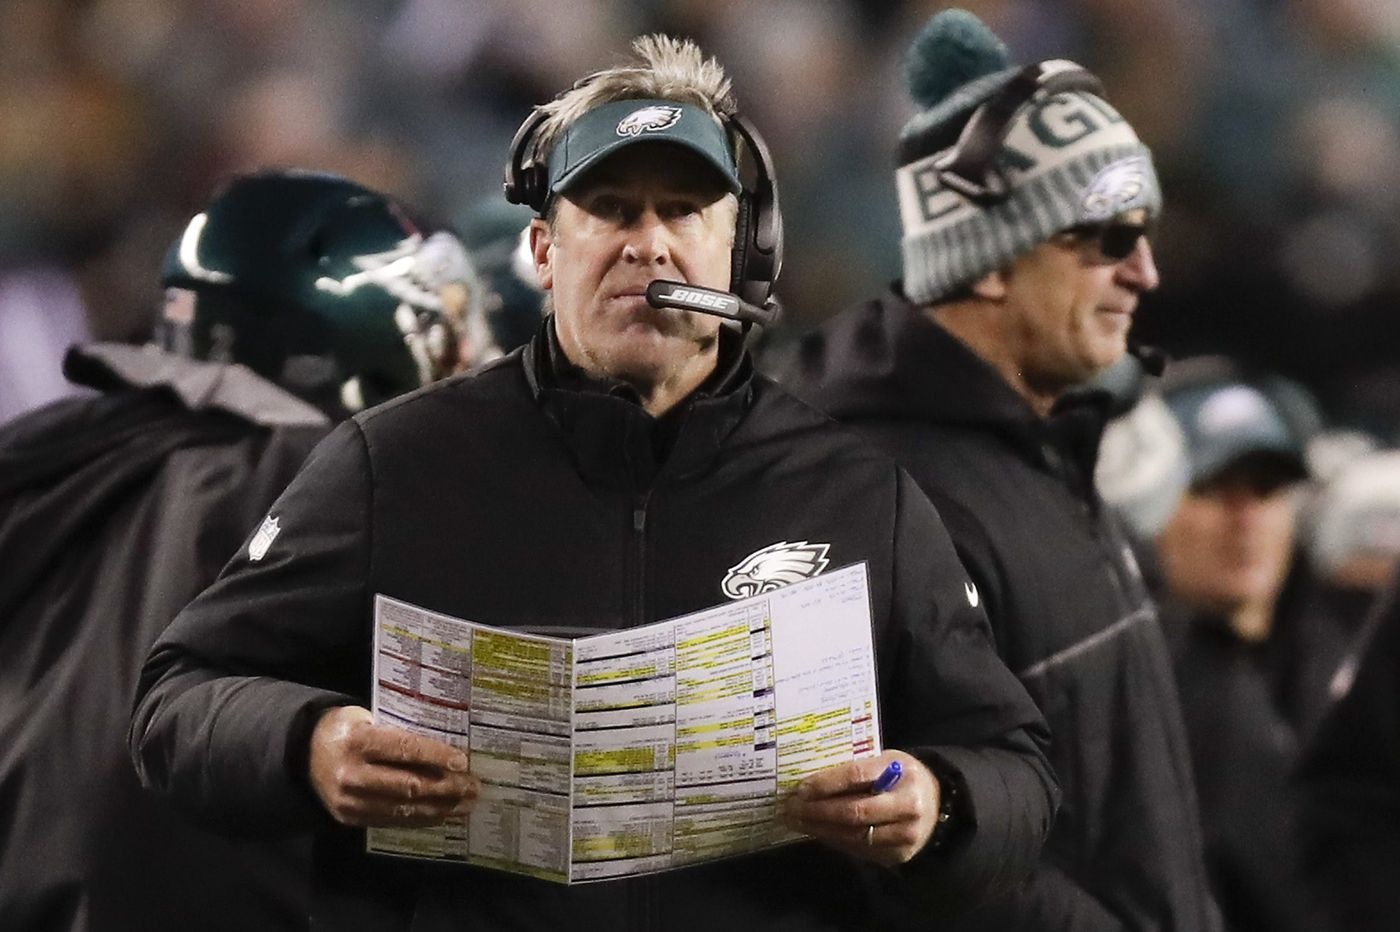 Eagles coach Doug Pederson's press conference at 10:30 | Live video